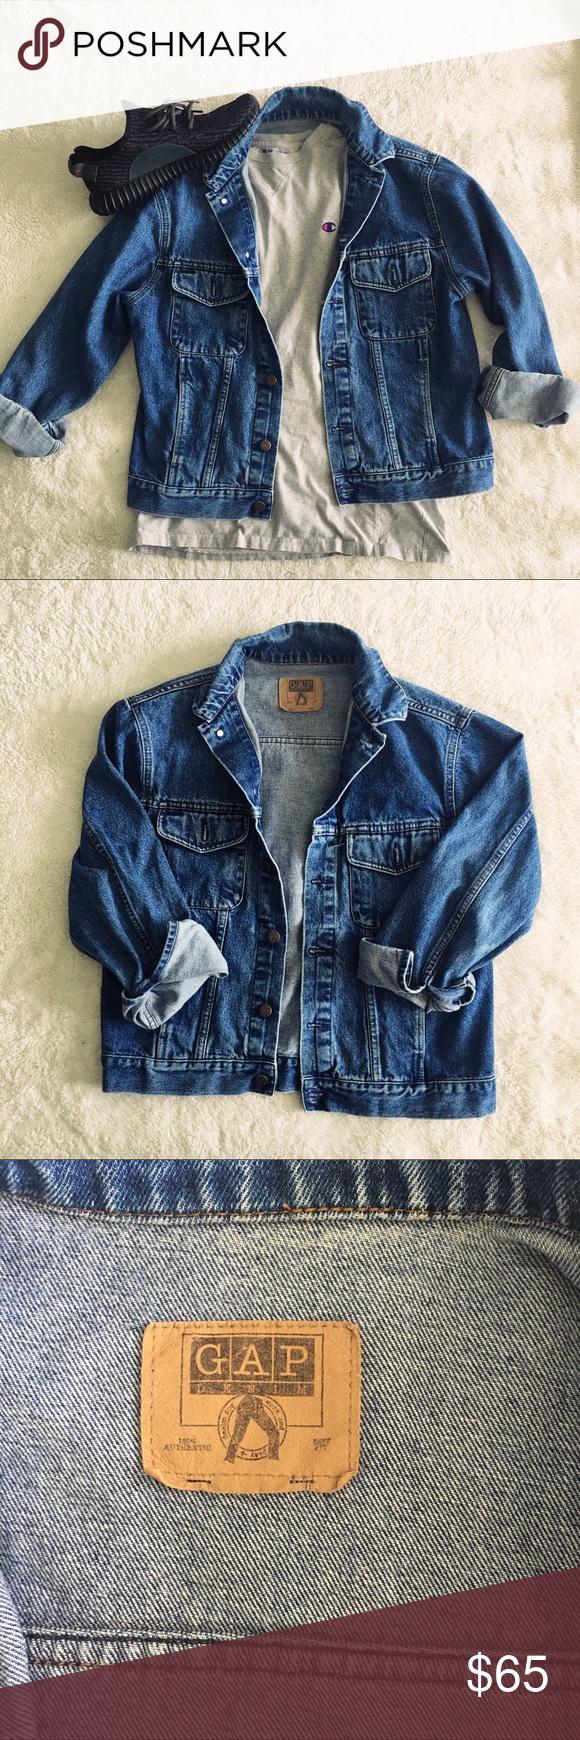 Vintage oversized ss gap denim jacket super cute and on trend